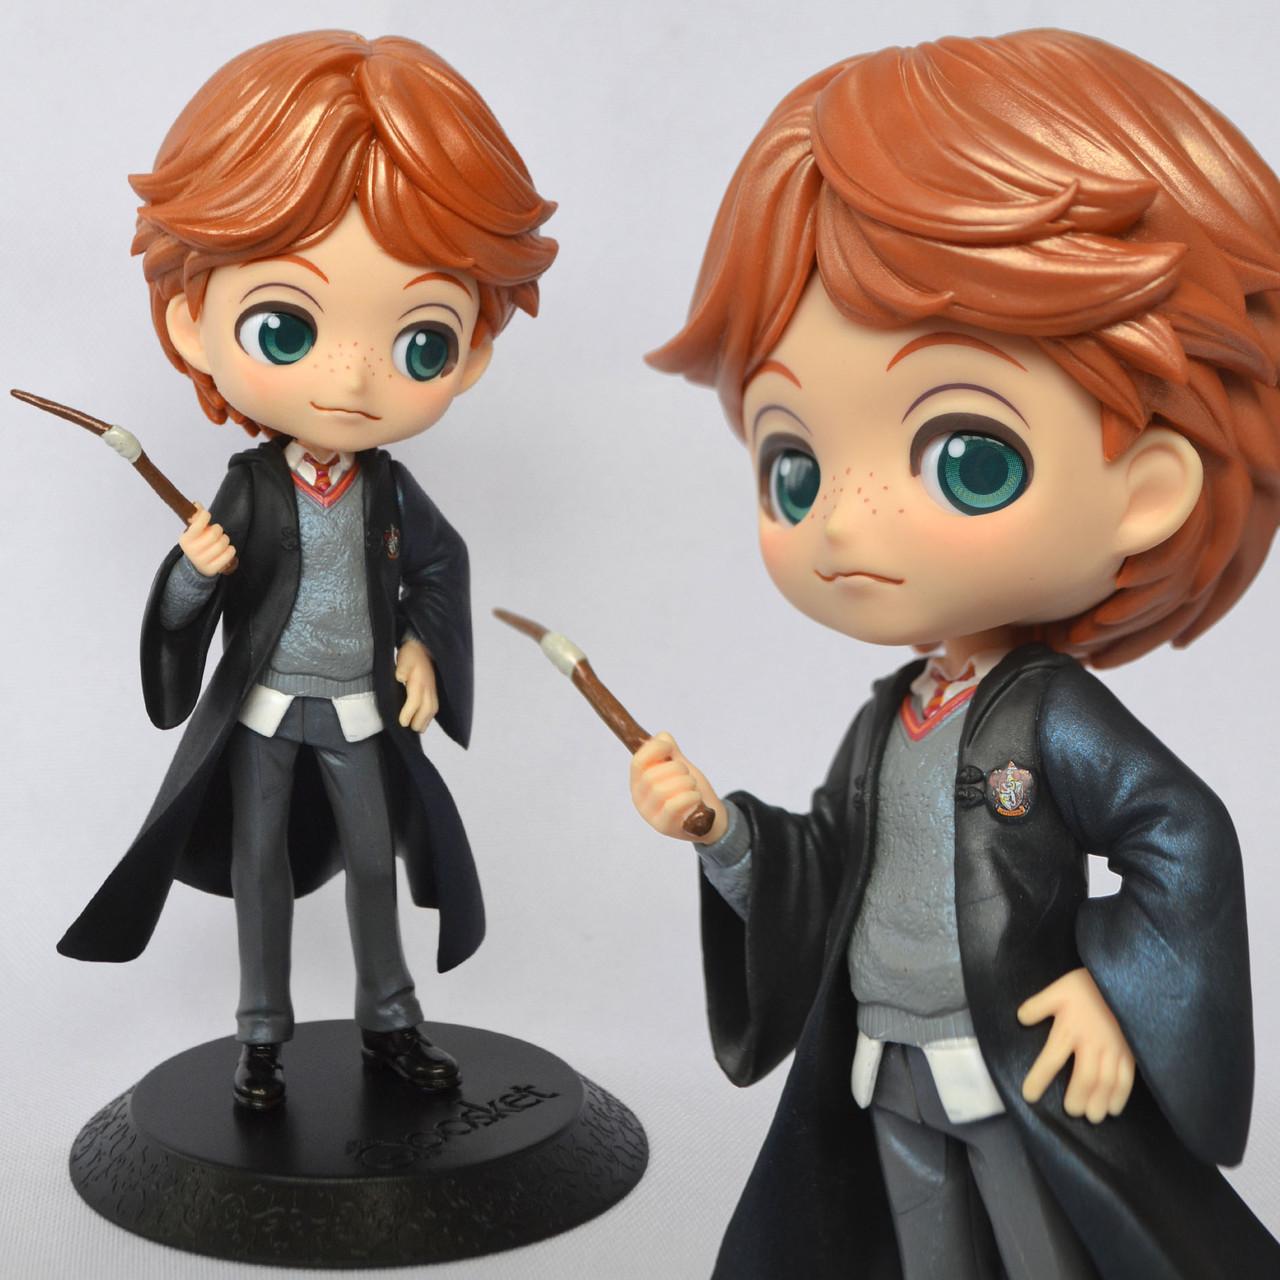 Фігурка Harry Potter - Ron W-B Qposket Banpresto